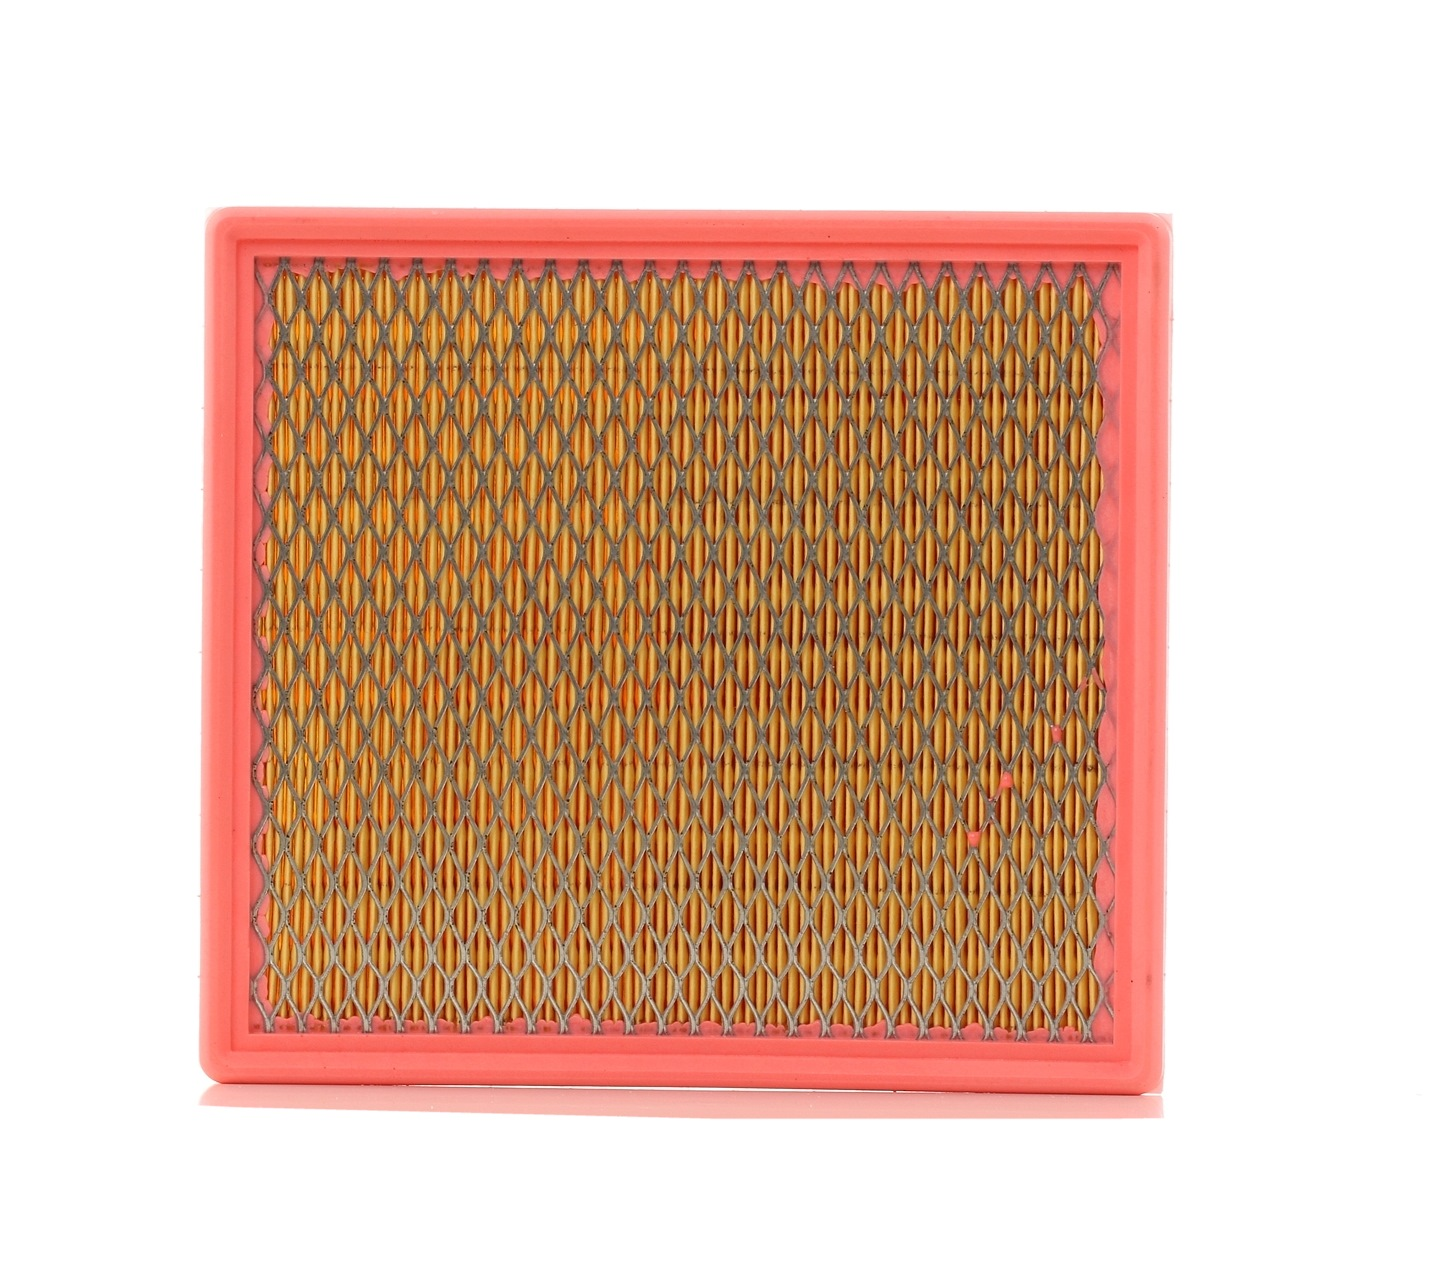 Image of MANN-FILTER Air Filter CHRYSLER,DODGE C 24 100 04809782AA,04861480AA,4861480AA Engine Filter K04809782AA,K04861480AA